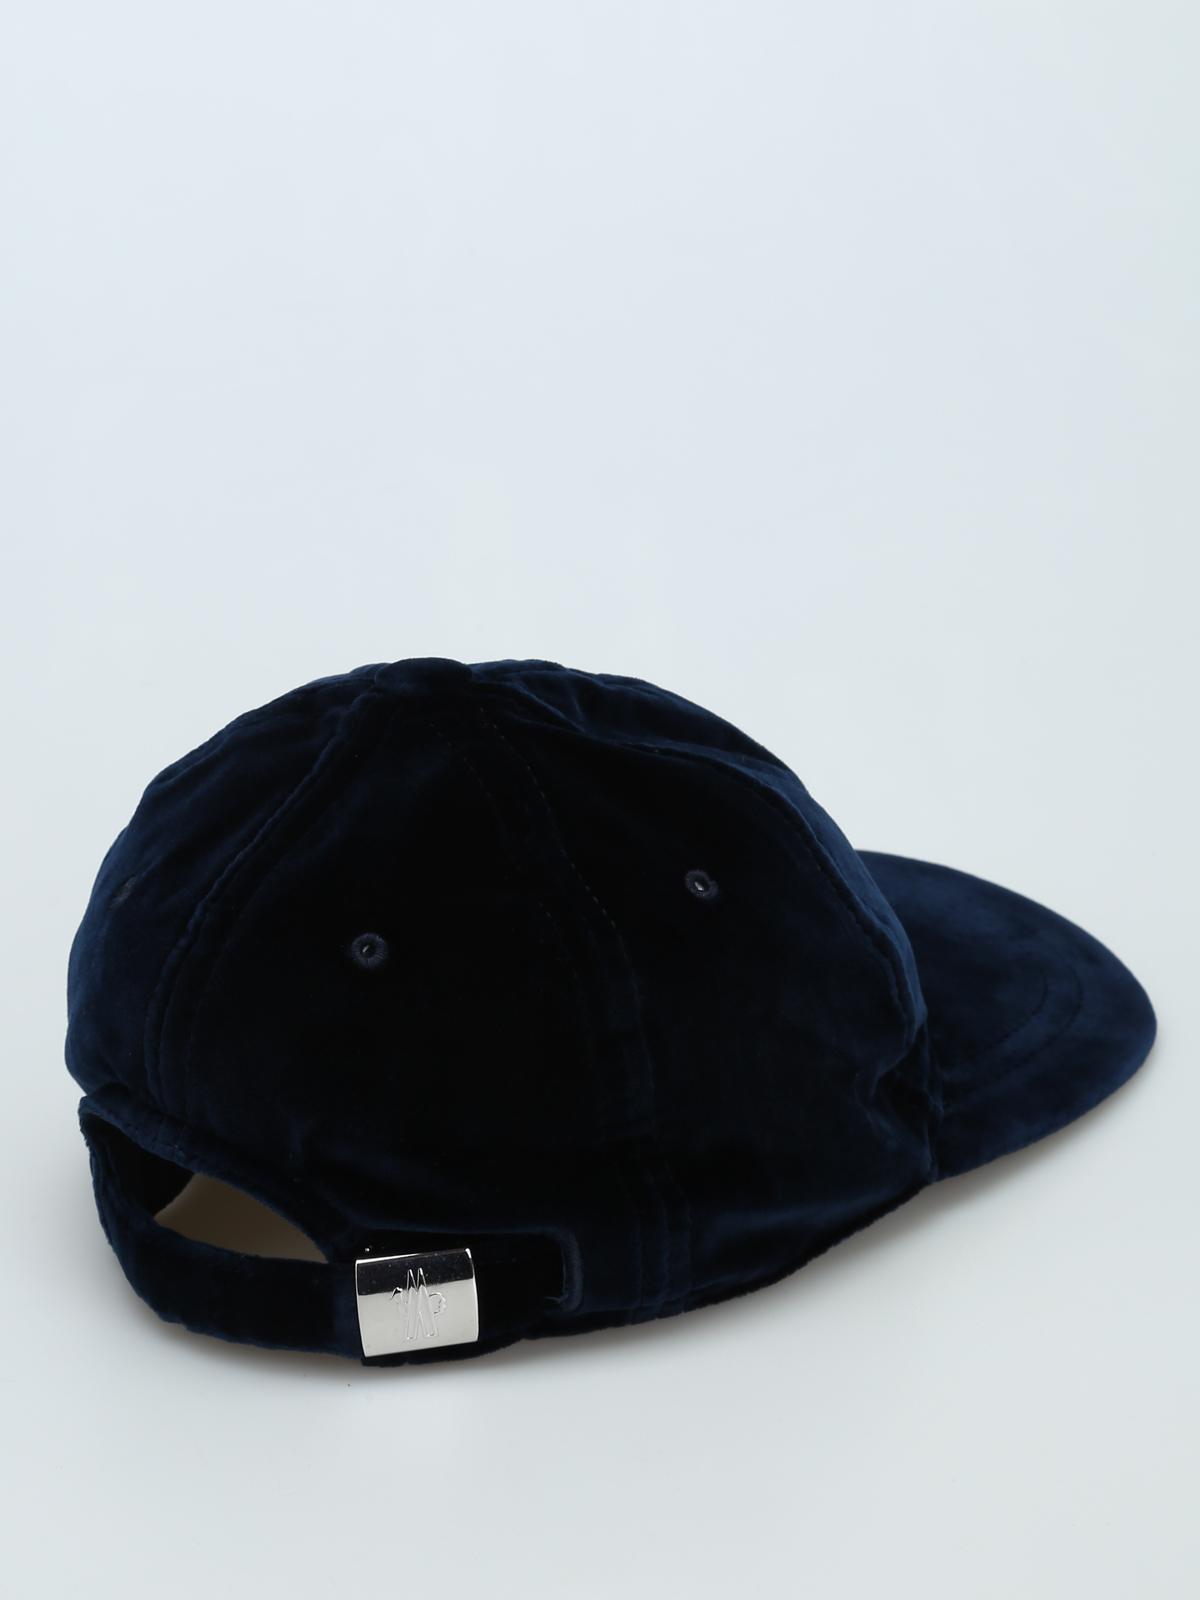 2f0a7605c51 Moncler - Blue velvet baseball cap - hats   caps - D2 093 0039700 ...